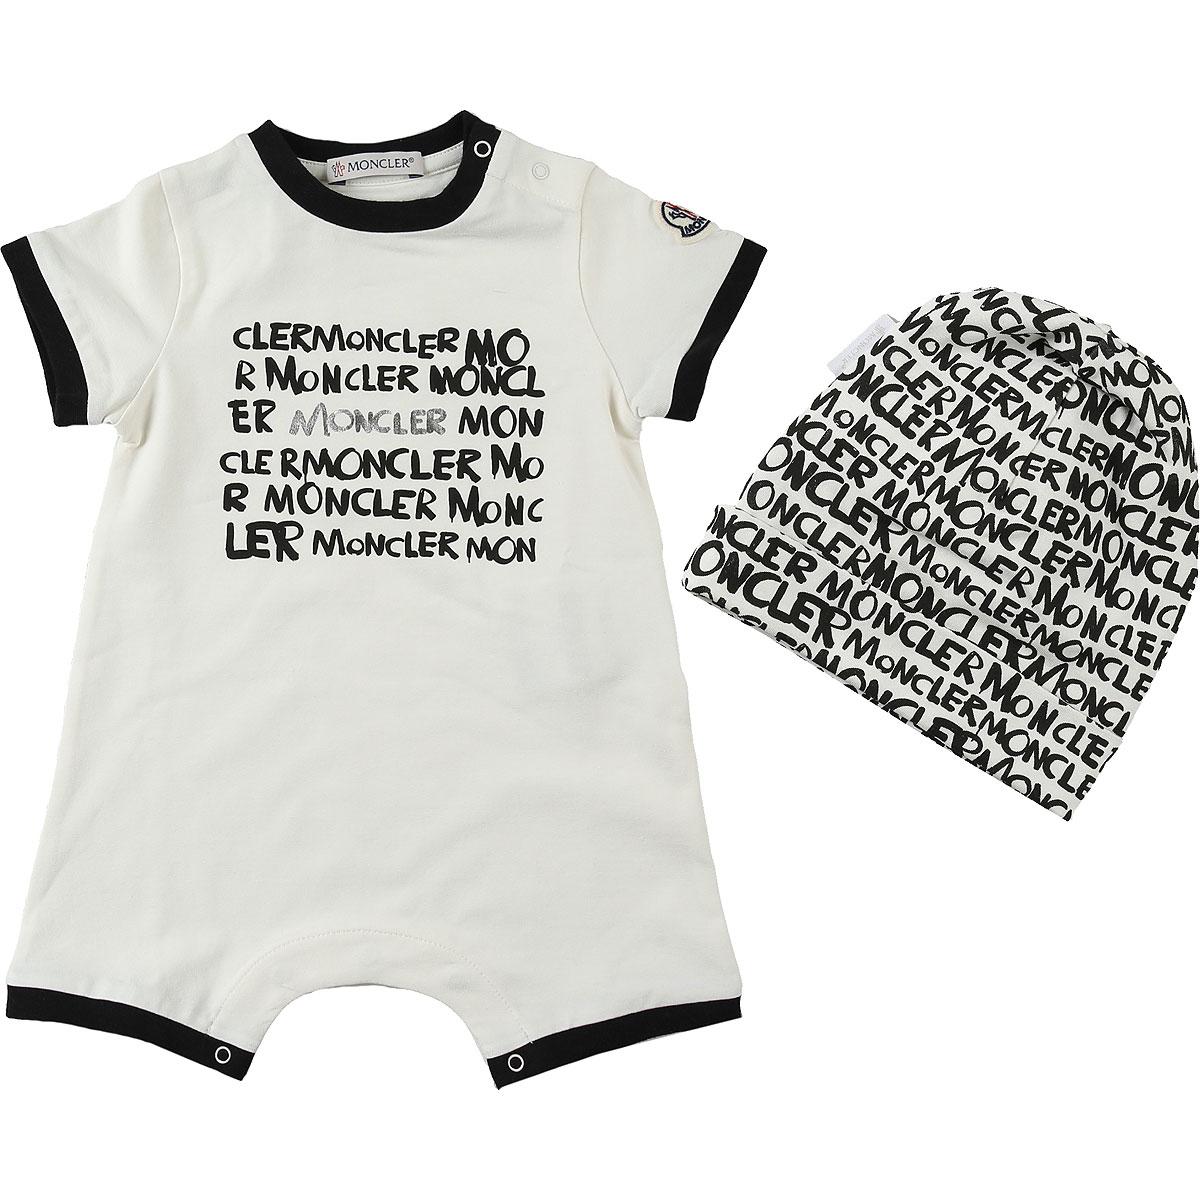 e7c1dcf62 Baby Boy Clothing Moncler, Style code: 8813406-8709a-034